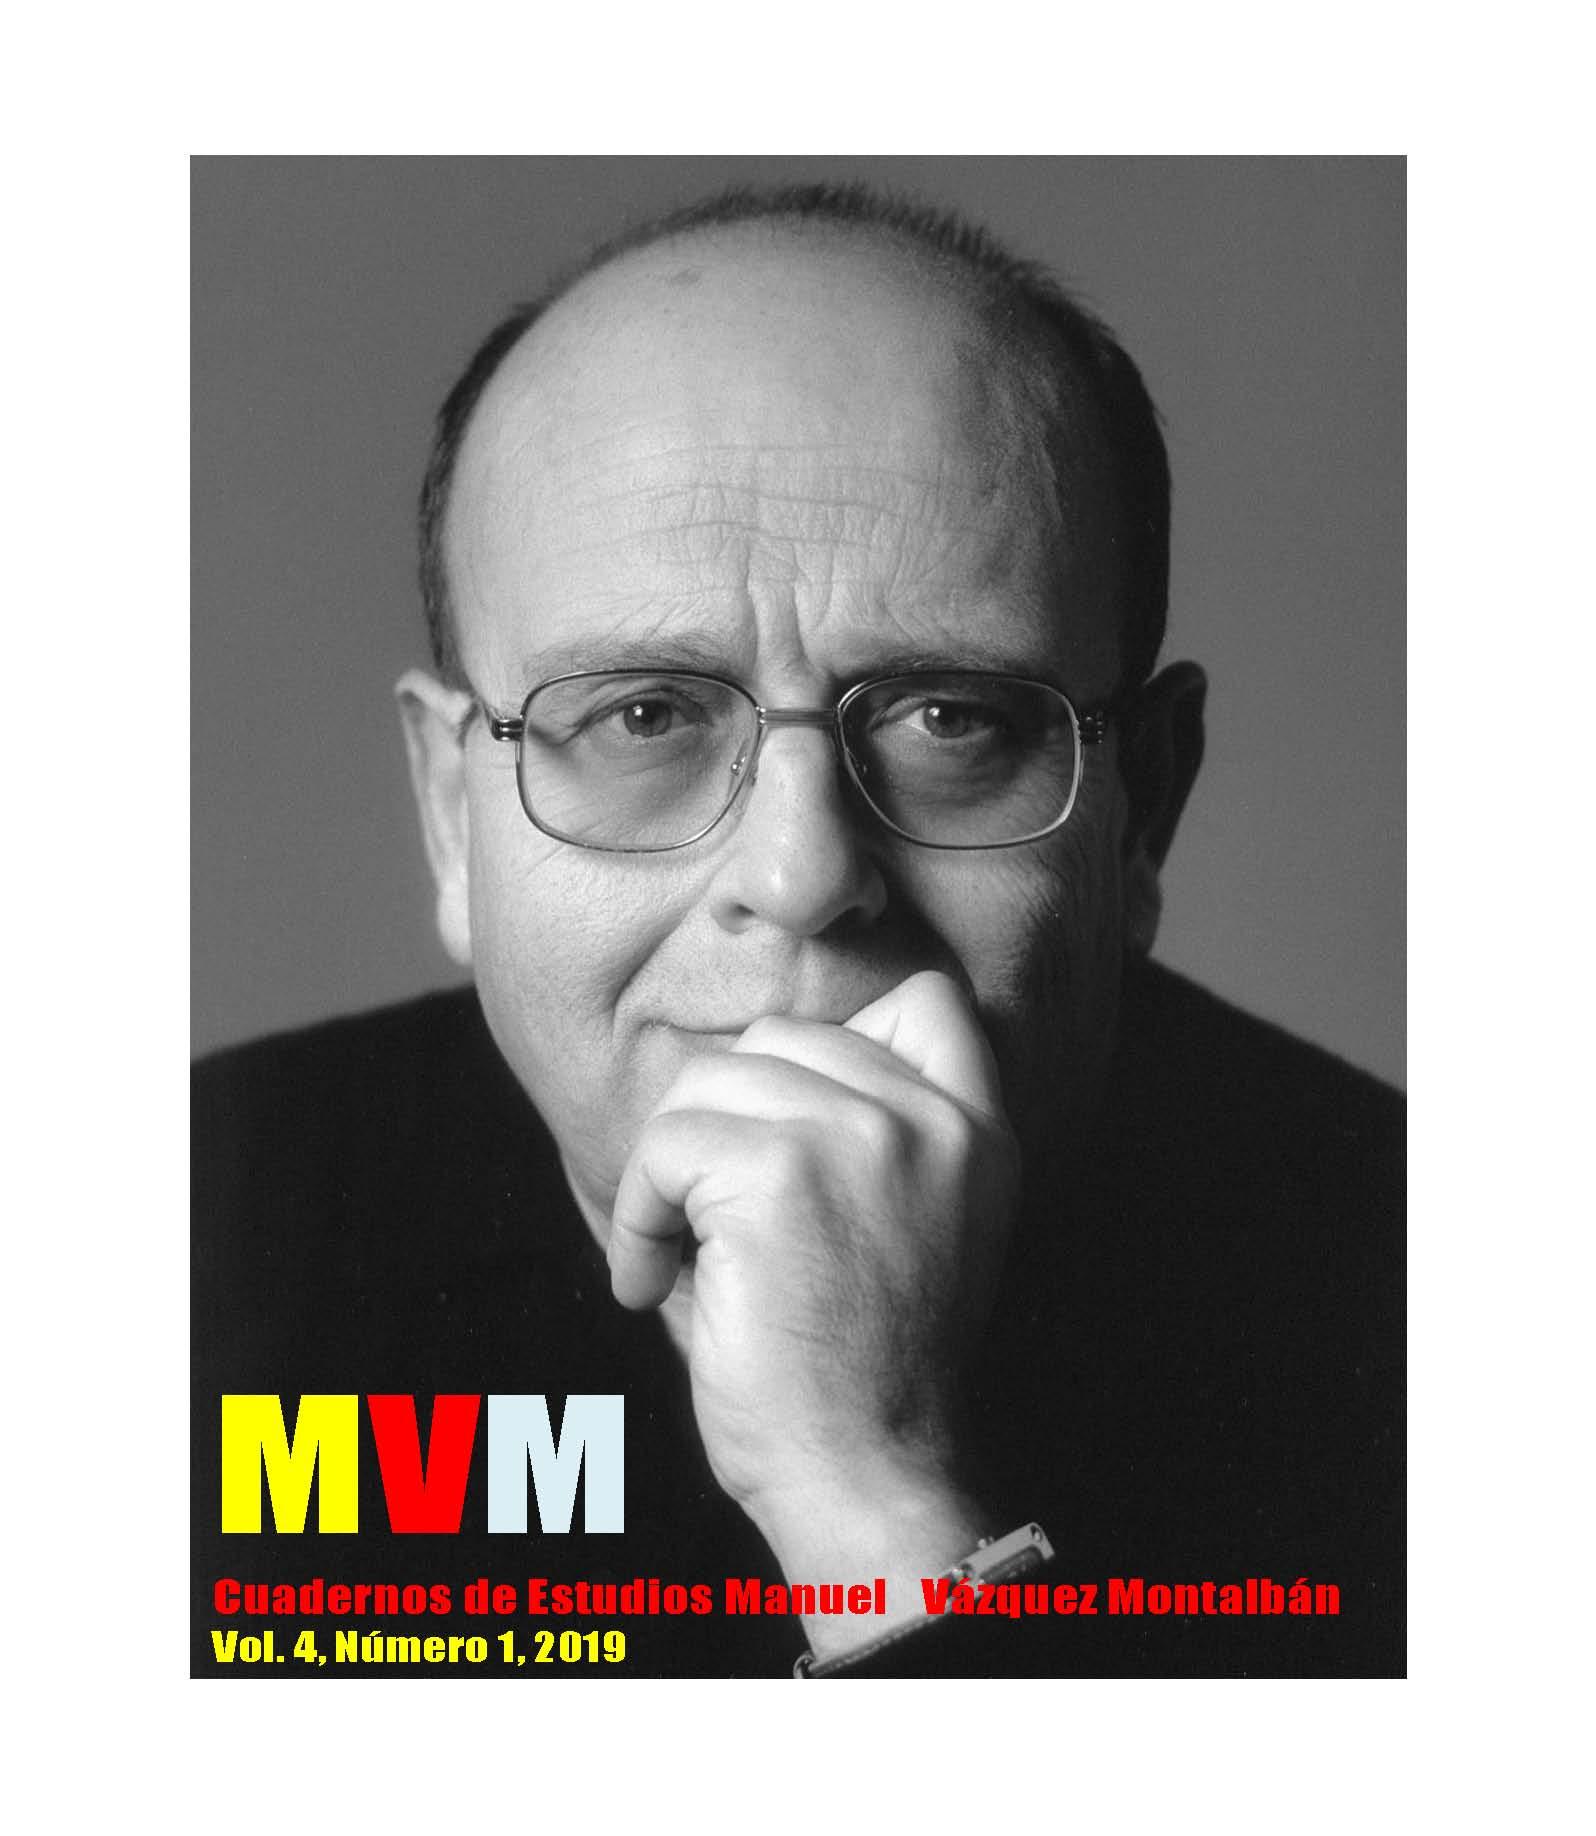 Ver Vol. 4 Núm. 1 (2019): MVM: Cuadernos de Estudios Manuel Vázquez Montalbán